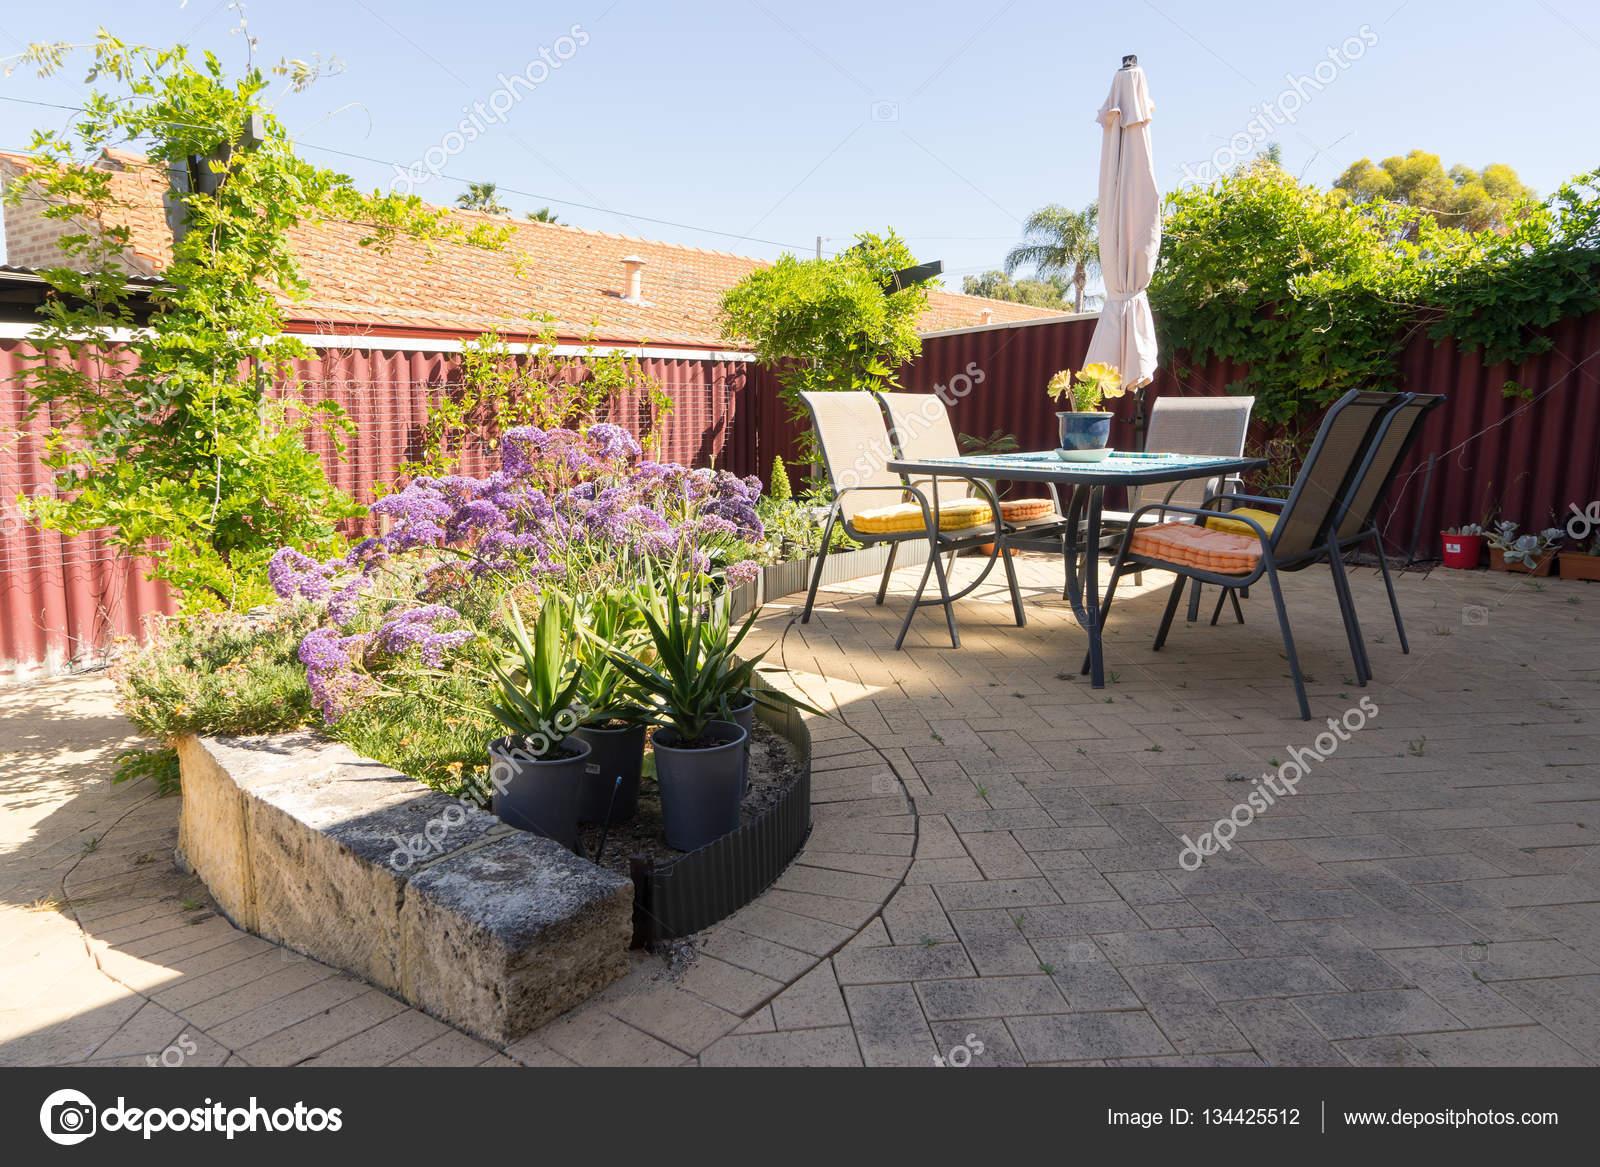 Giardino terrazza vista — Foto Stock © jamesteohart #134425512